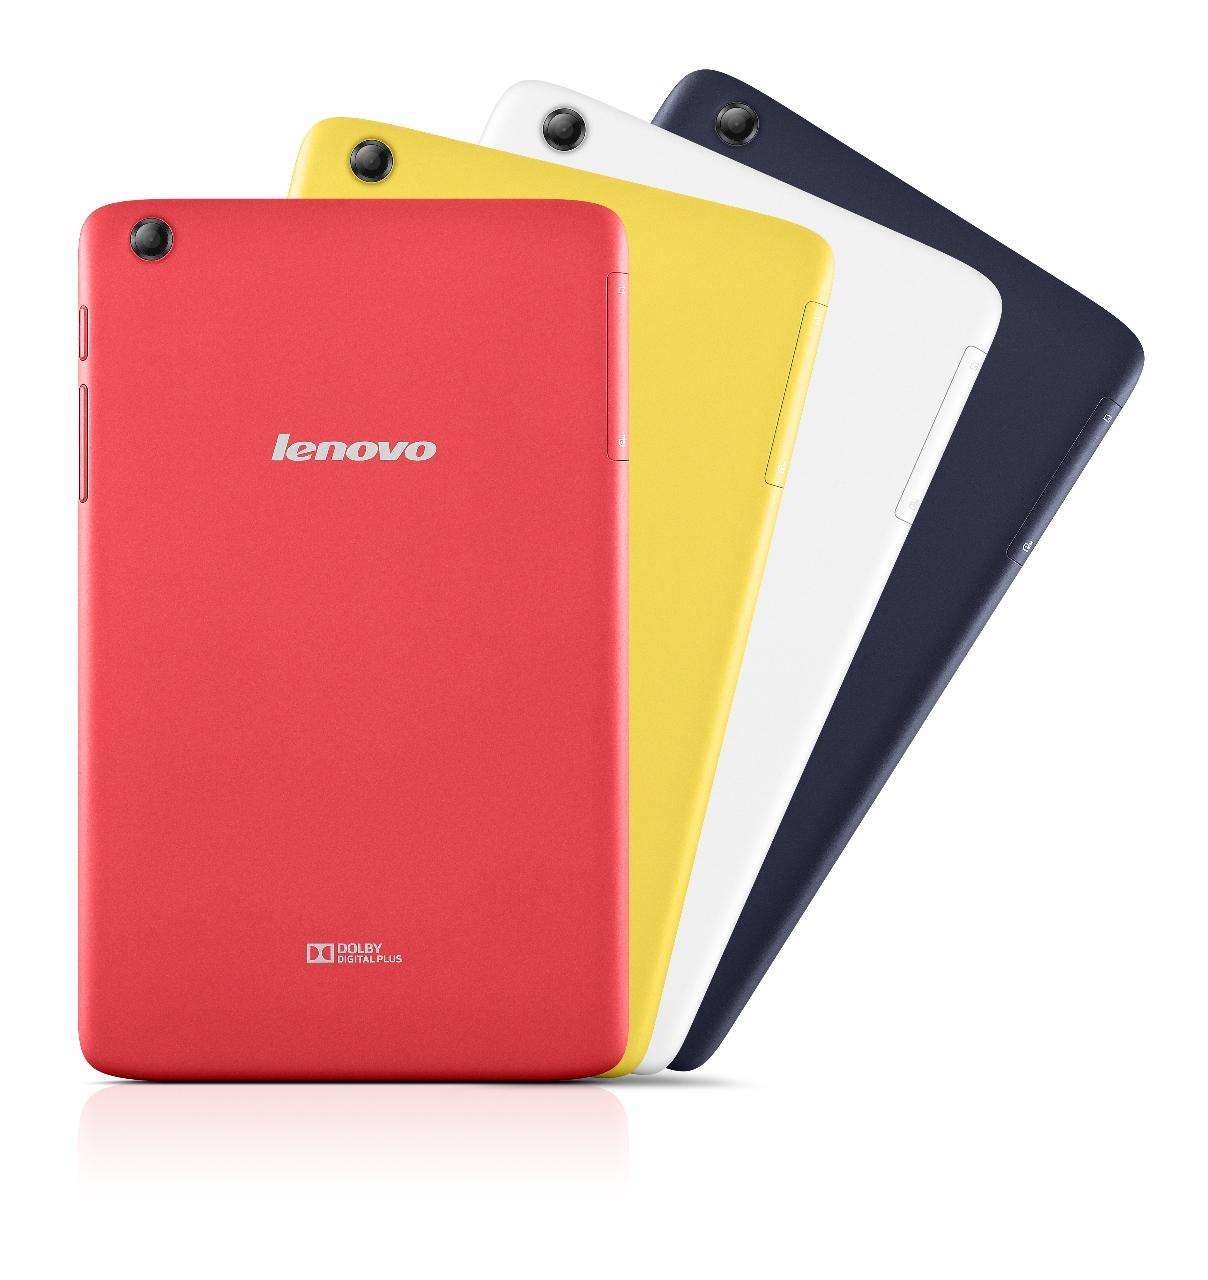 Nye Android-tablets fra Lenovo